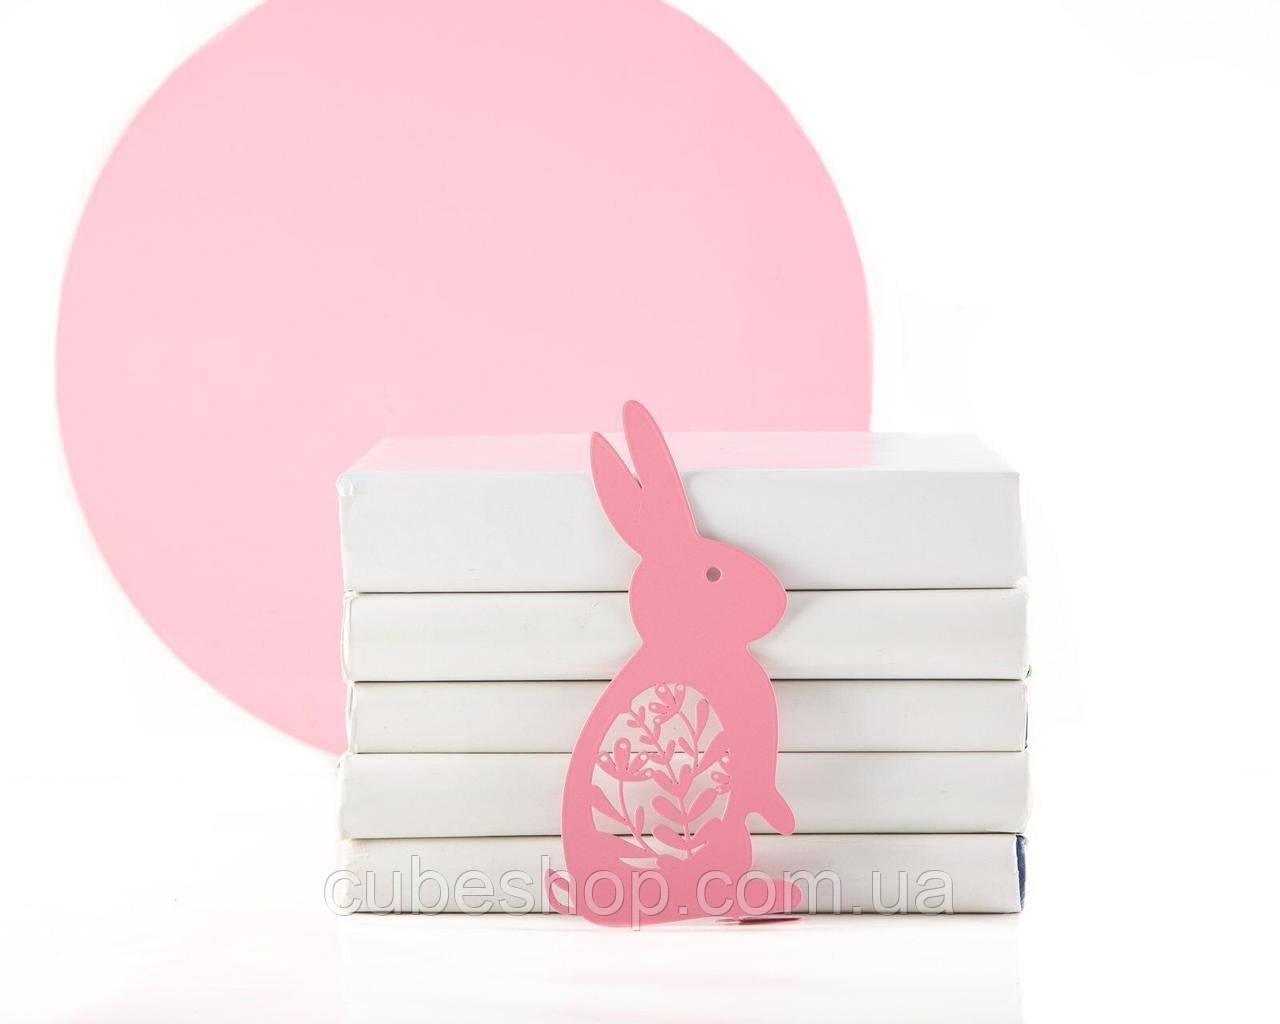 Закладка для книг Счастливый заяц (розовый цвет)